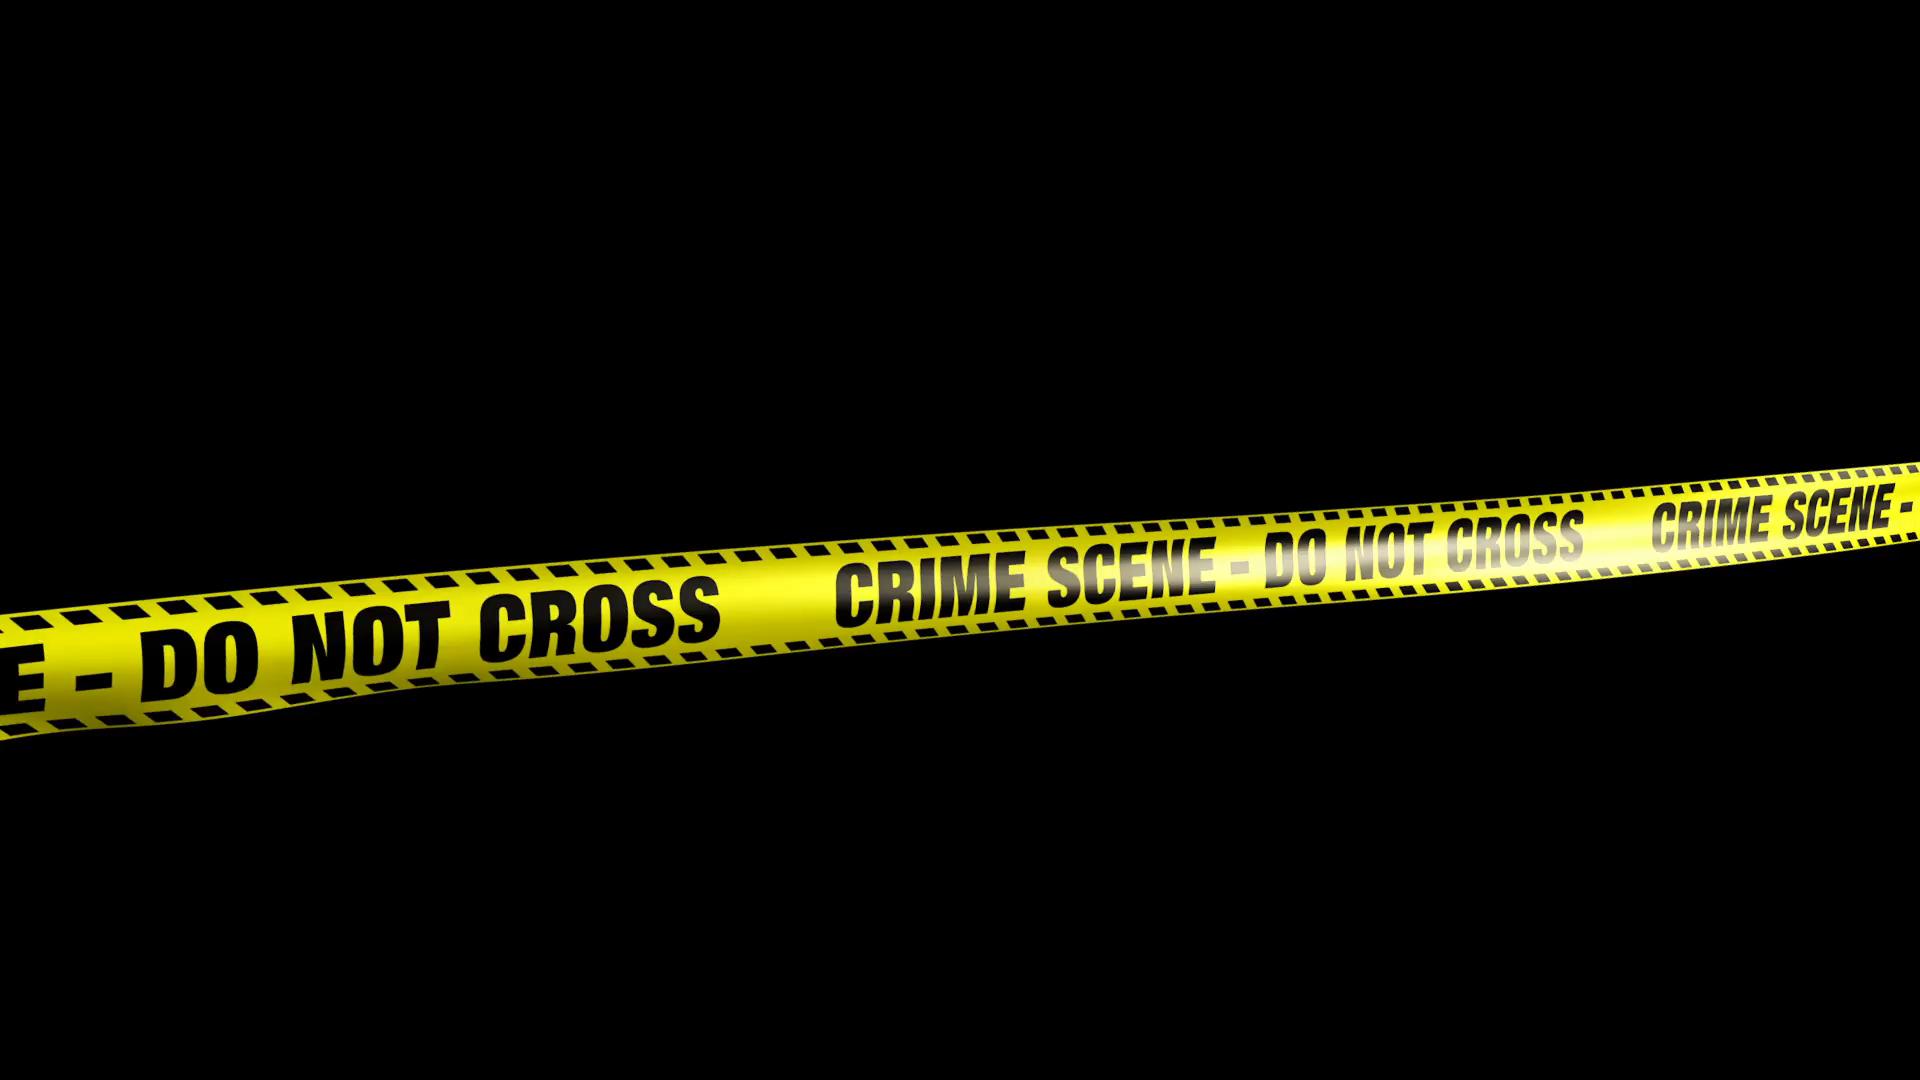 Crime Scene - Do Not Cross Yellow Caution Tape Motion Background -  VideoBlocks - Crime Scene PNG HD